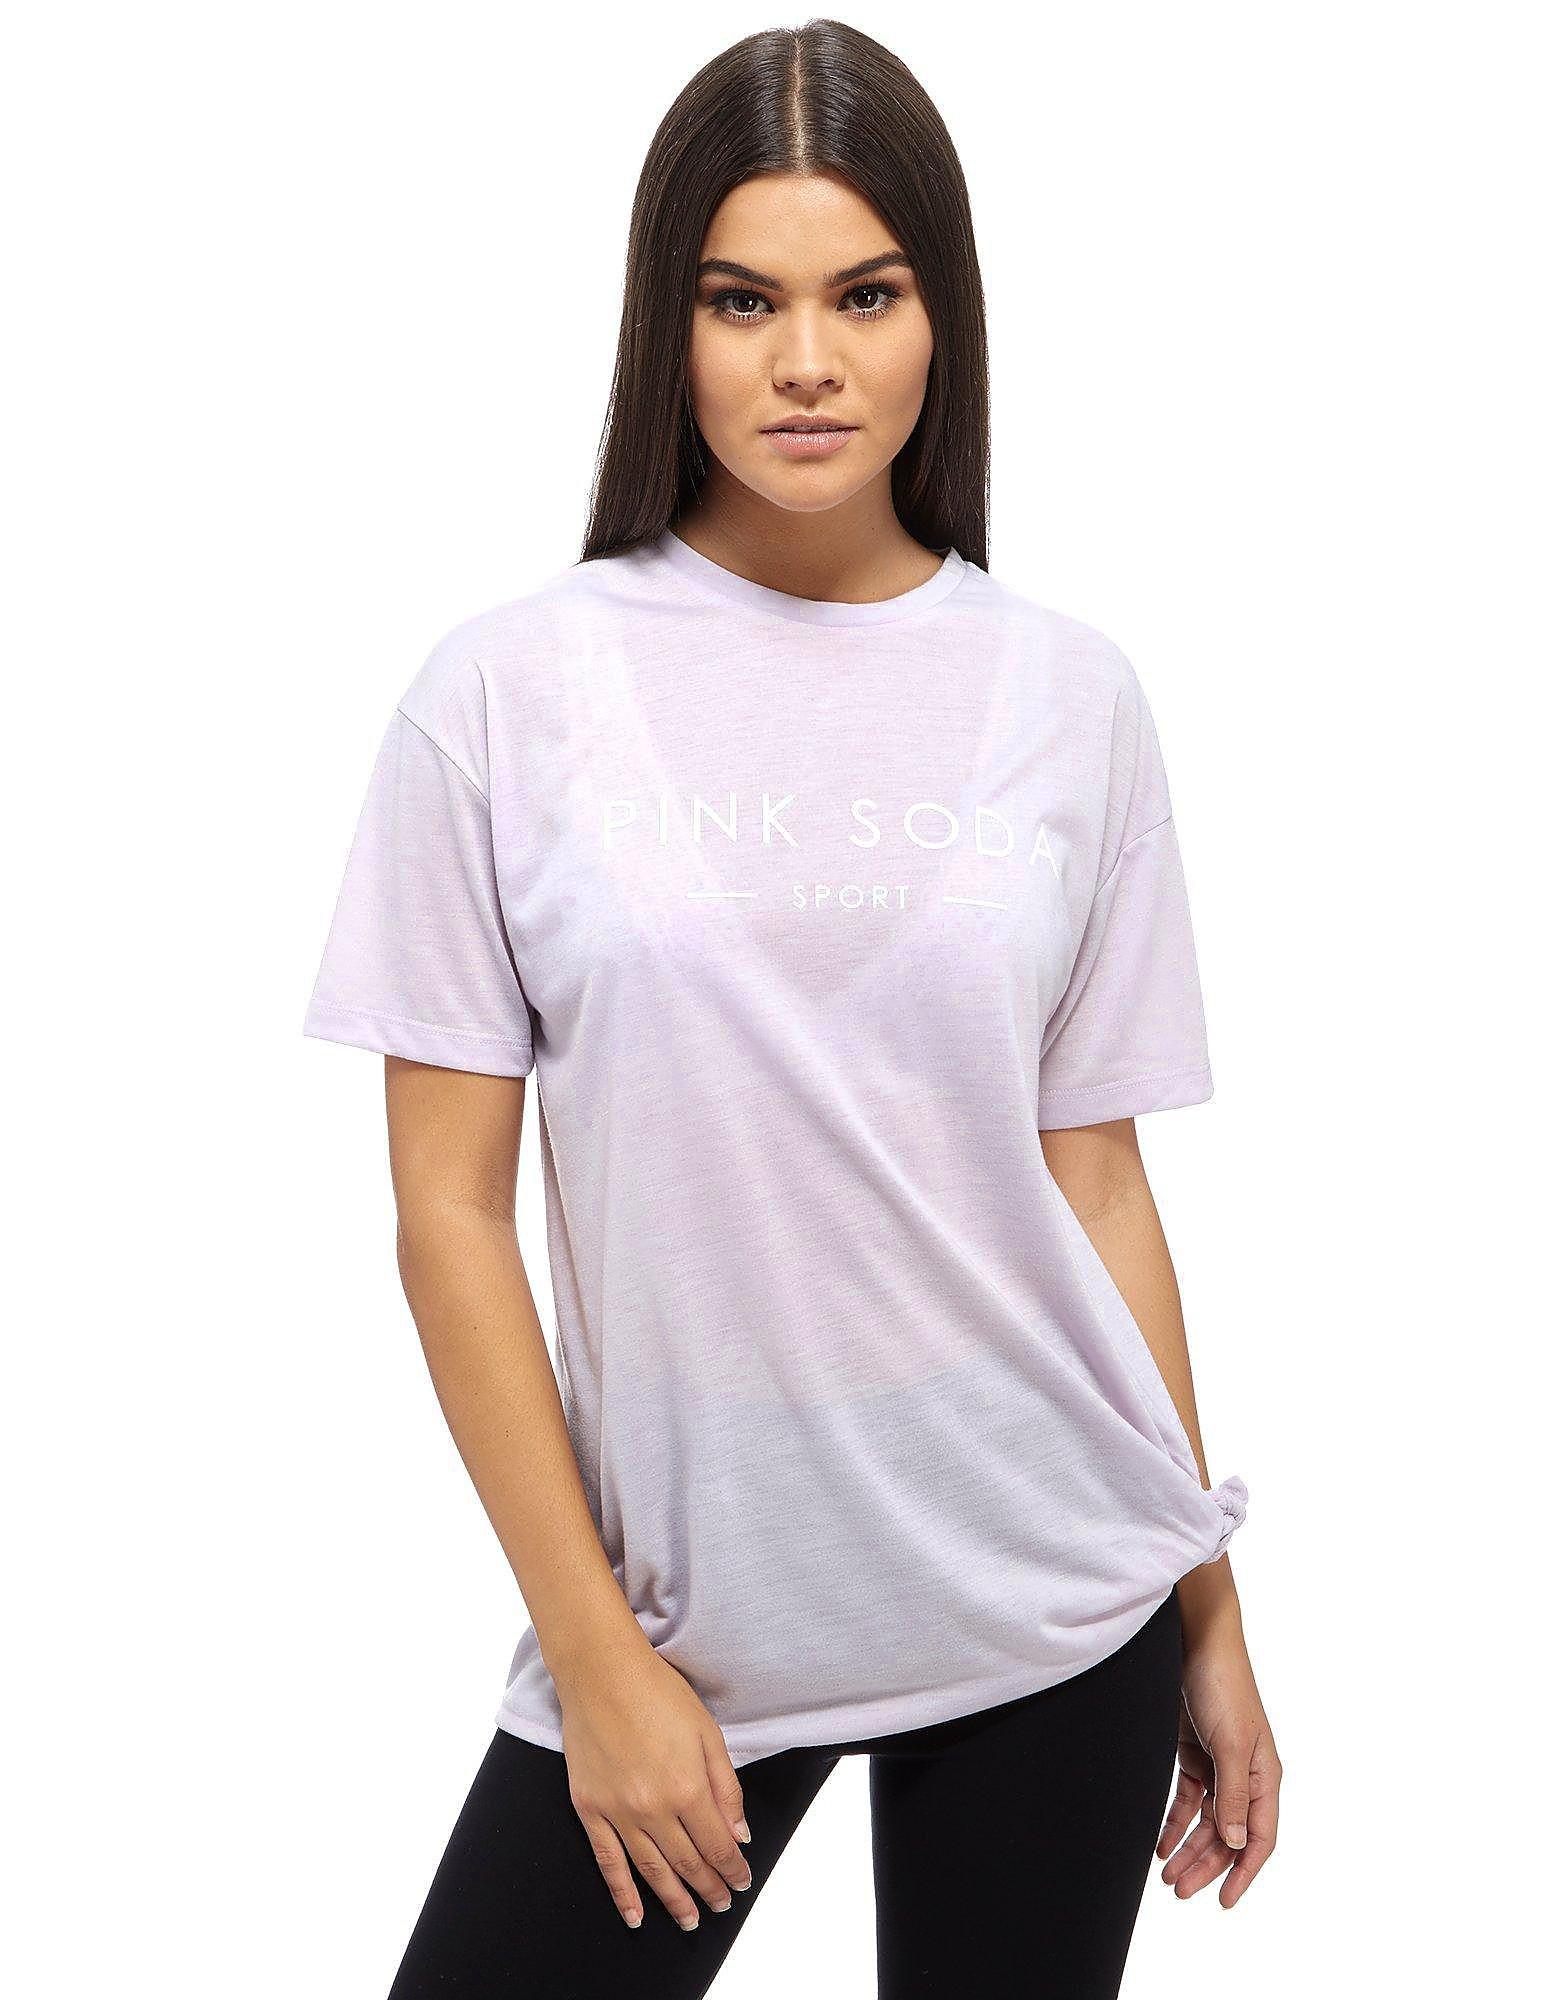 Pink Soda Sport Reps Knot T-Shirt